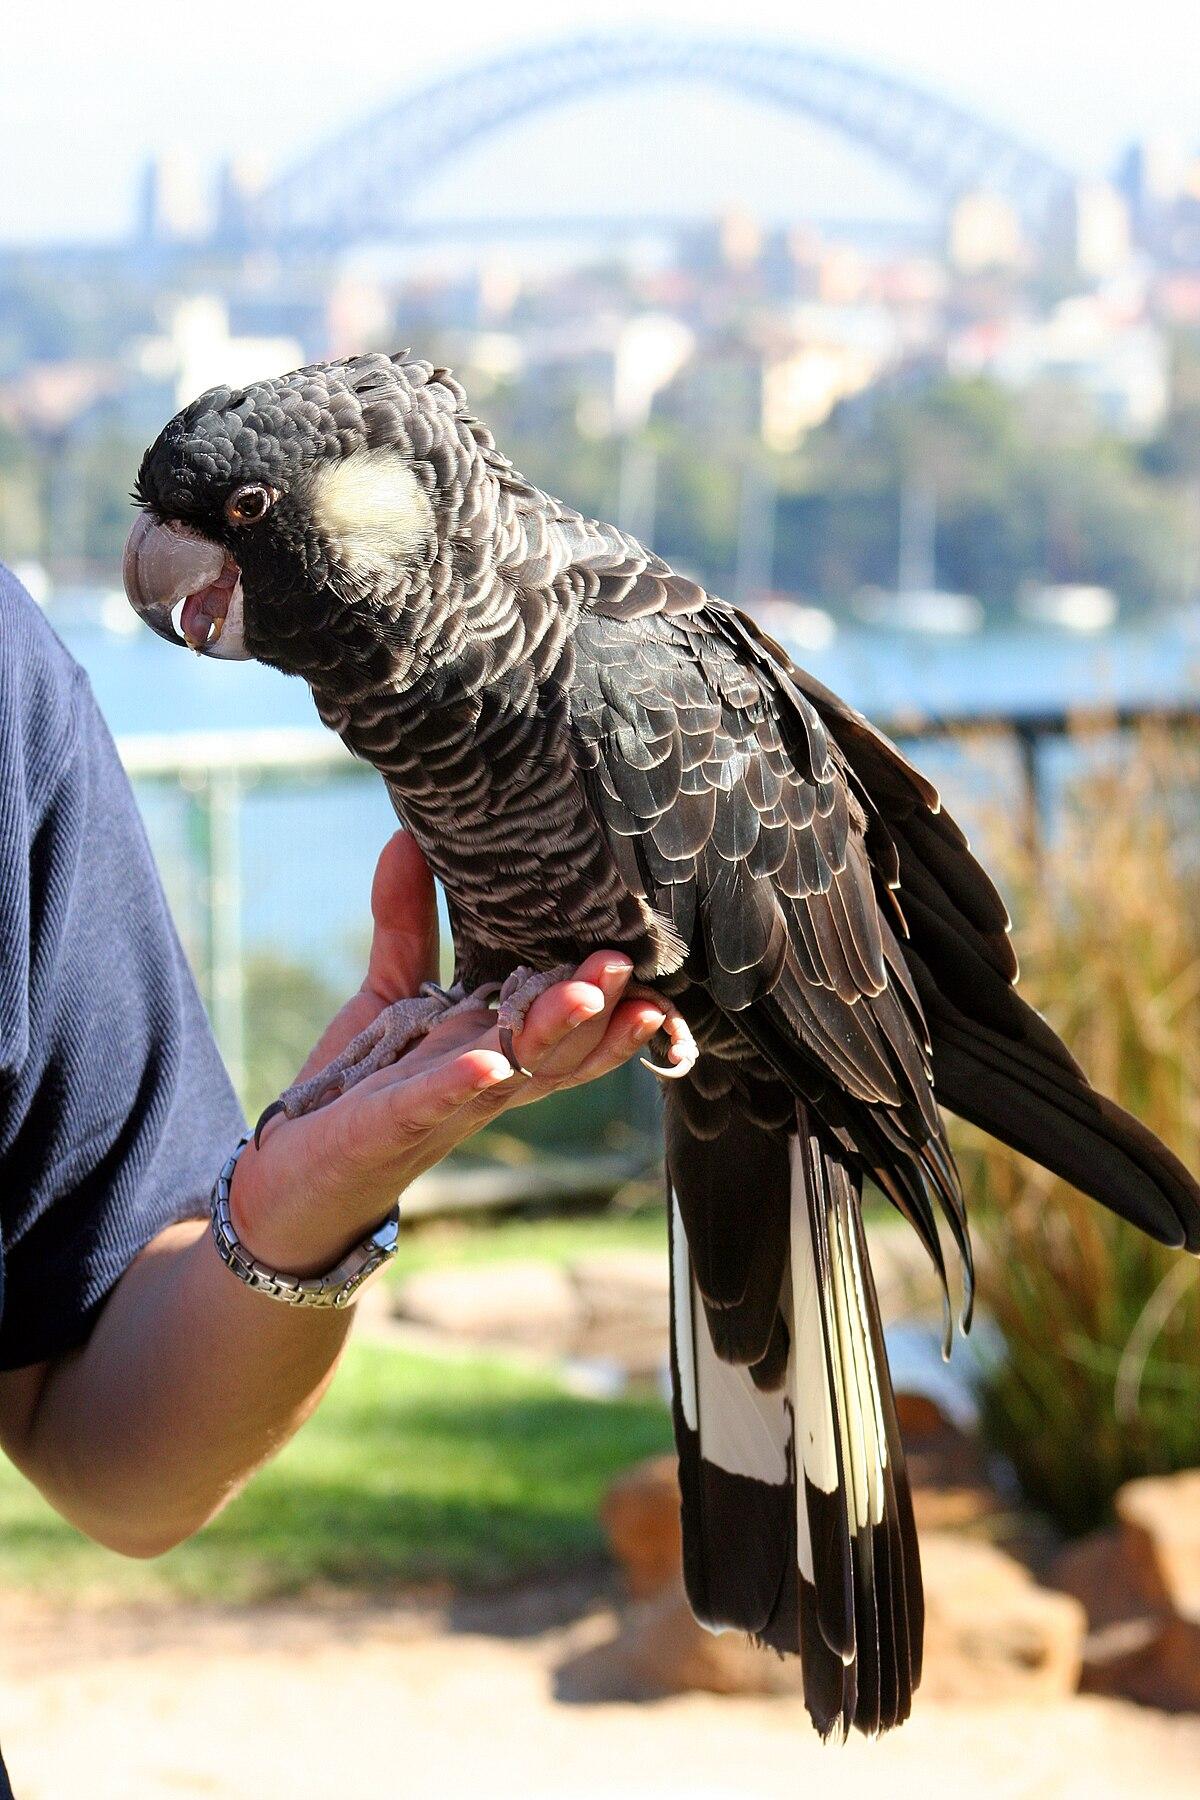 Carnaby's black cockatoo - Wikipedia